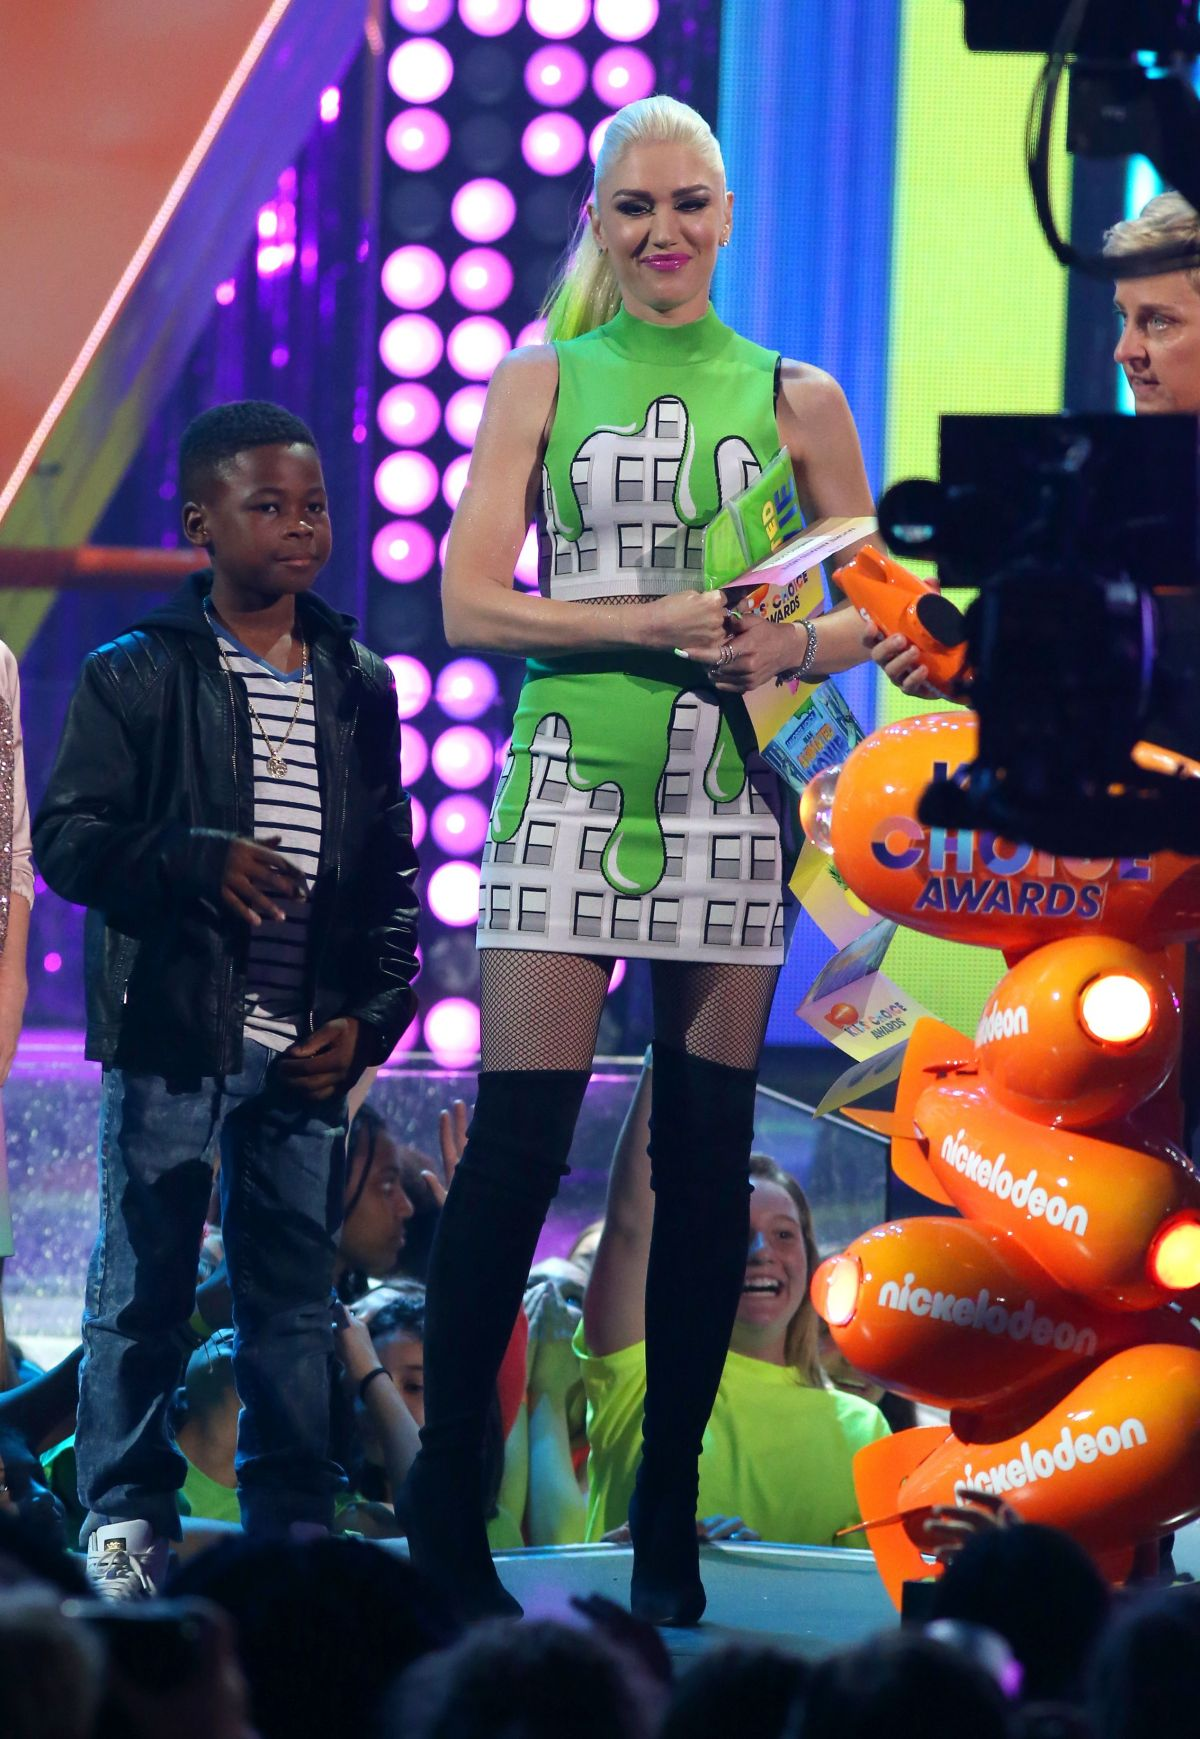 Gwen stefani nickelodeons kids choice awards in los angeles nude (79 photo)